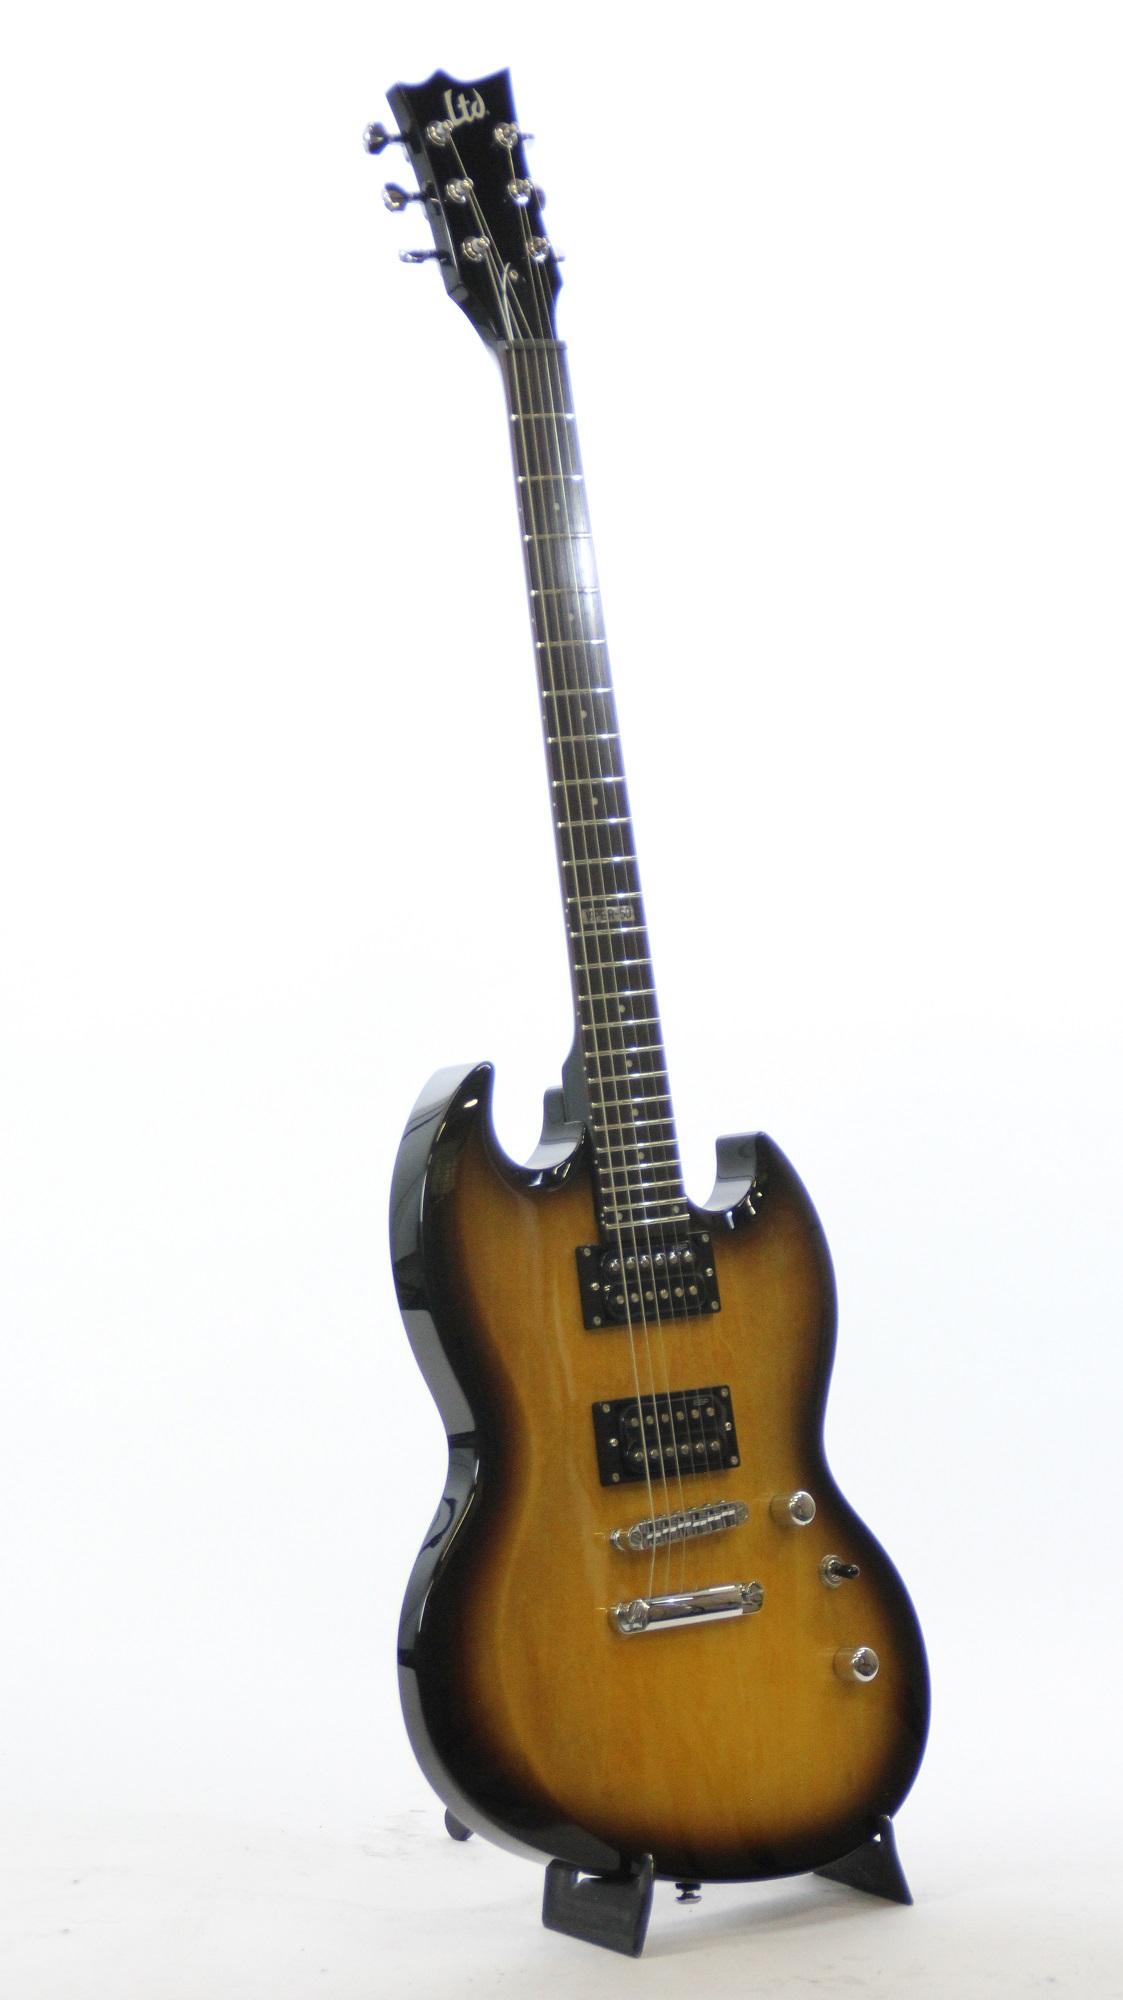 esp ltd viper 50 2 tone burst sample prototype electric guitar 2156 6. Black Bedroom Furniture Sets. Home Design Ideas